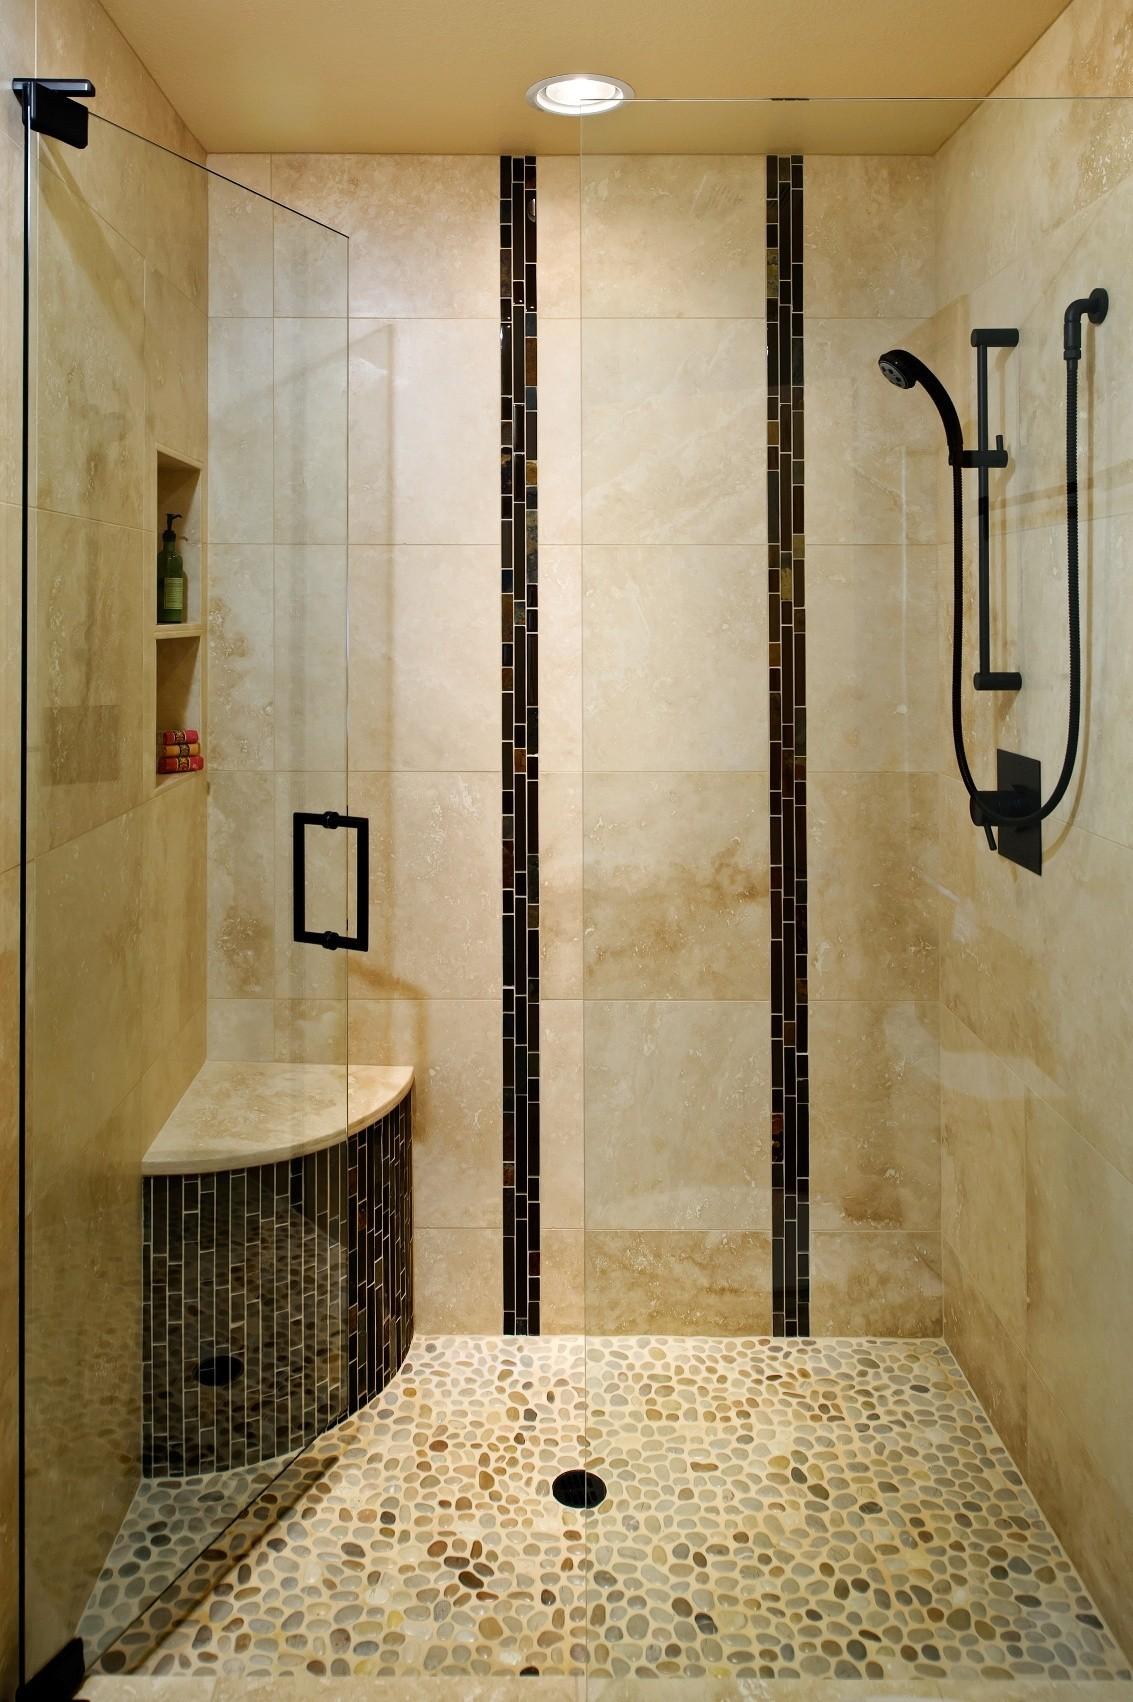 Bathroom tiles design ideas for small bathrooms fresh lovely small bathroom tile ideas on home decor